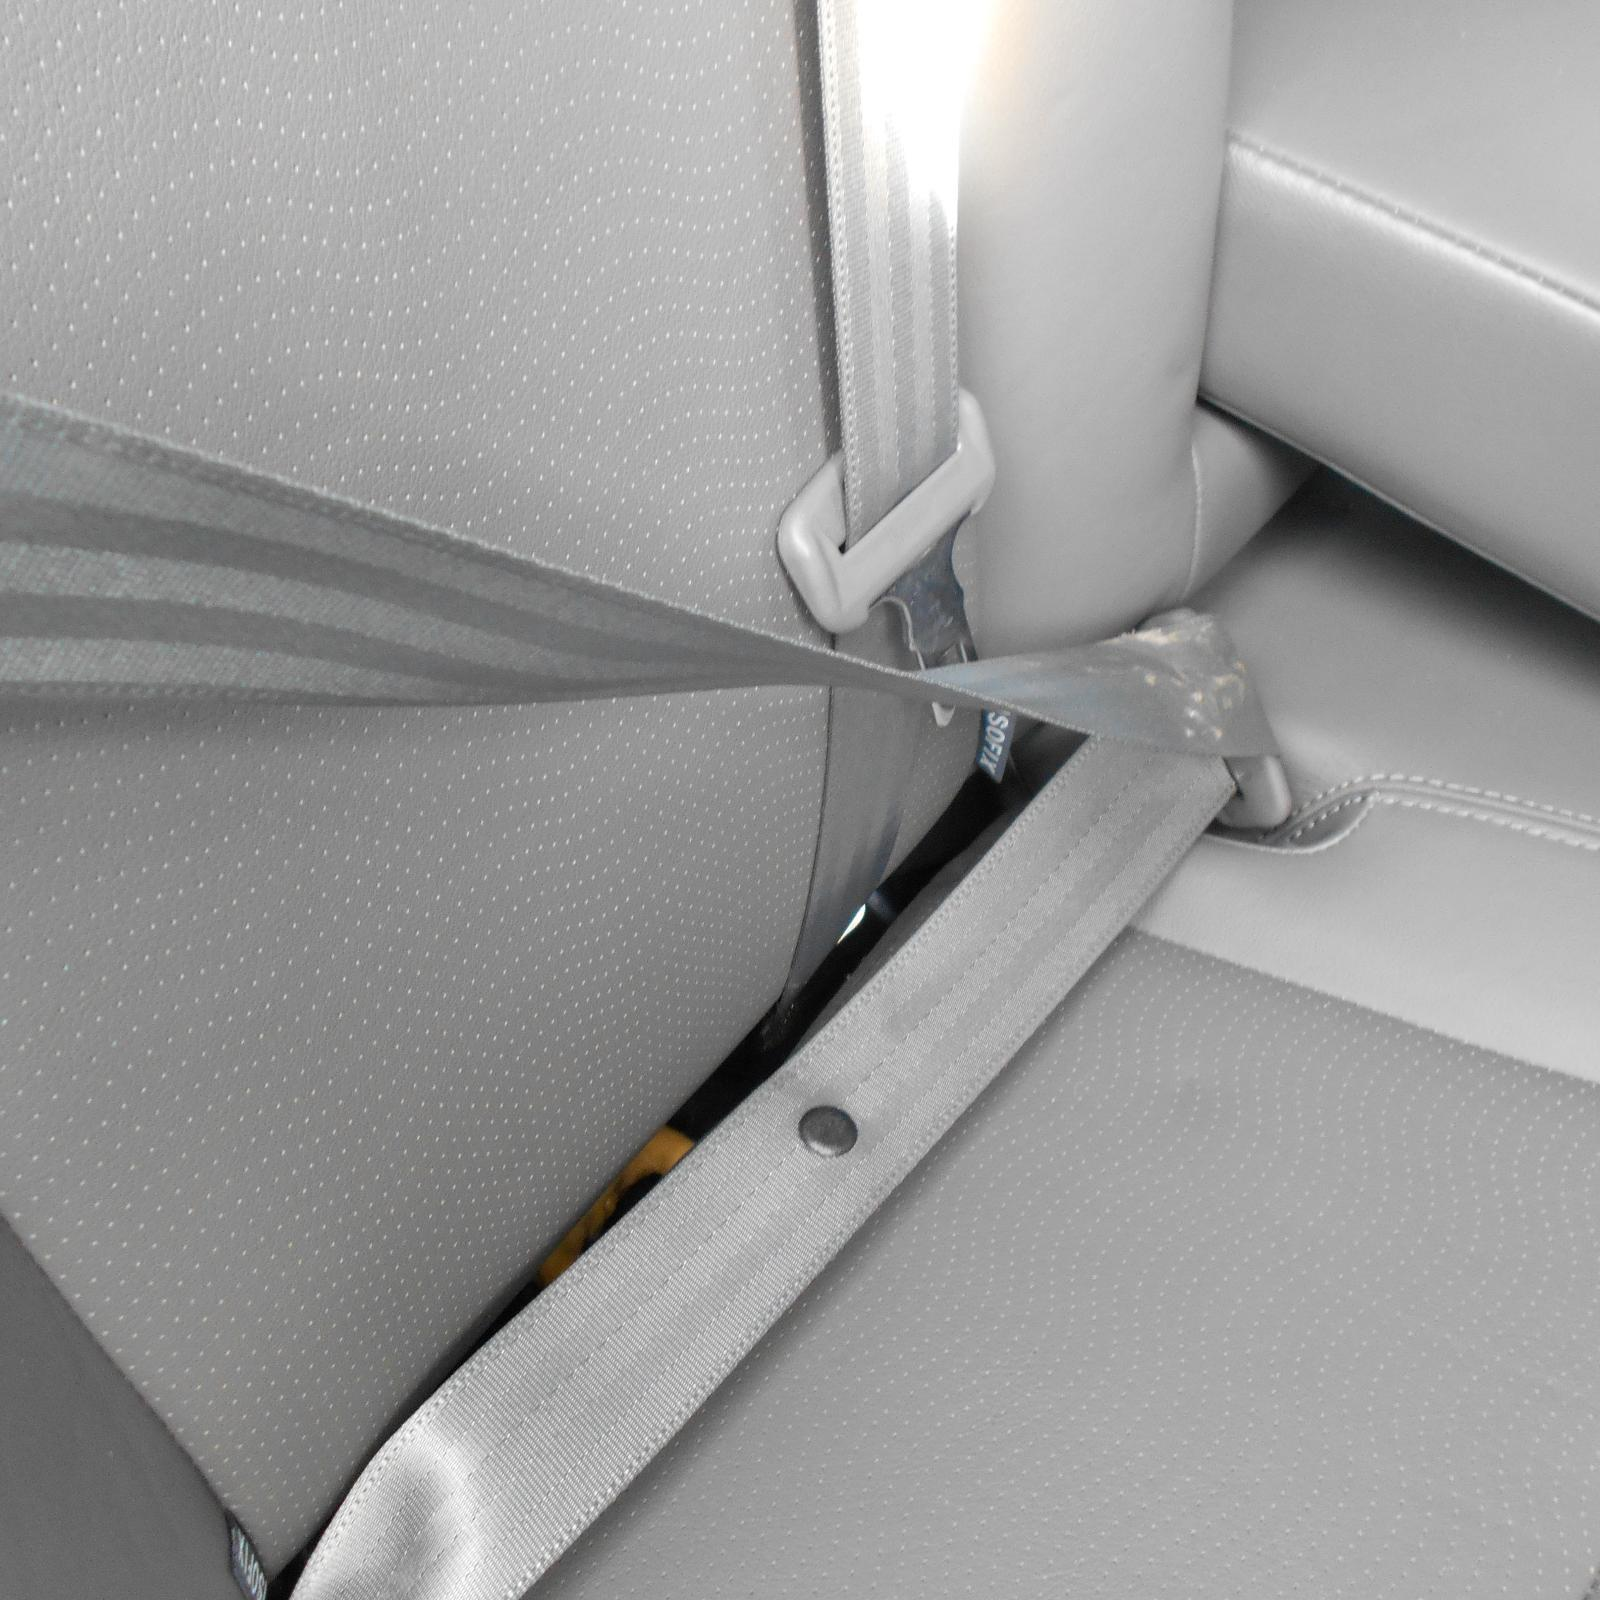 TOYOTA PRIUS, Seatbelt/Stalk, RH REAR, SEAT BELT STALK ONLY, ZVW30R, 07/09-12/15